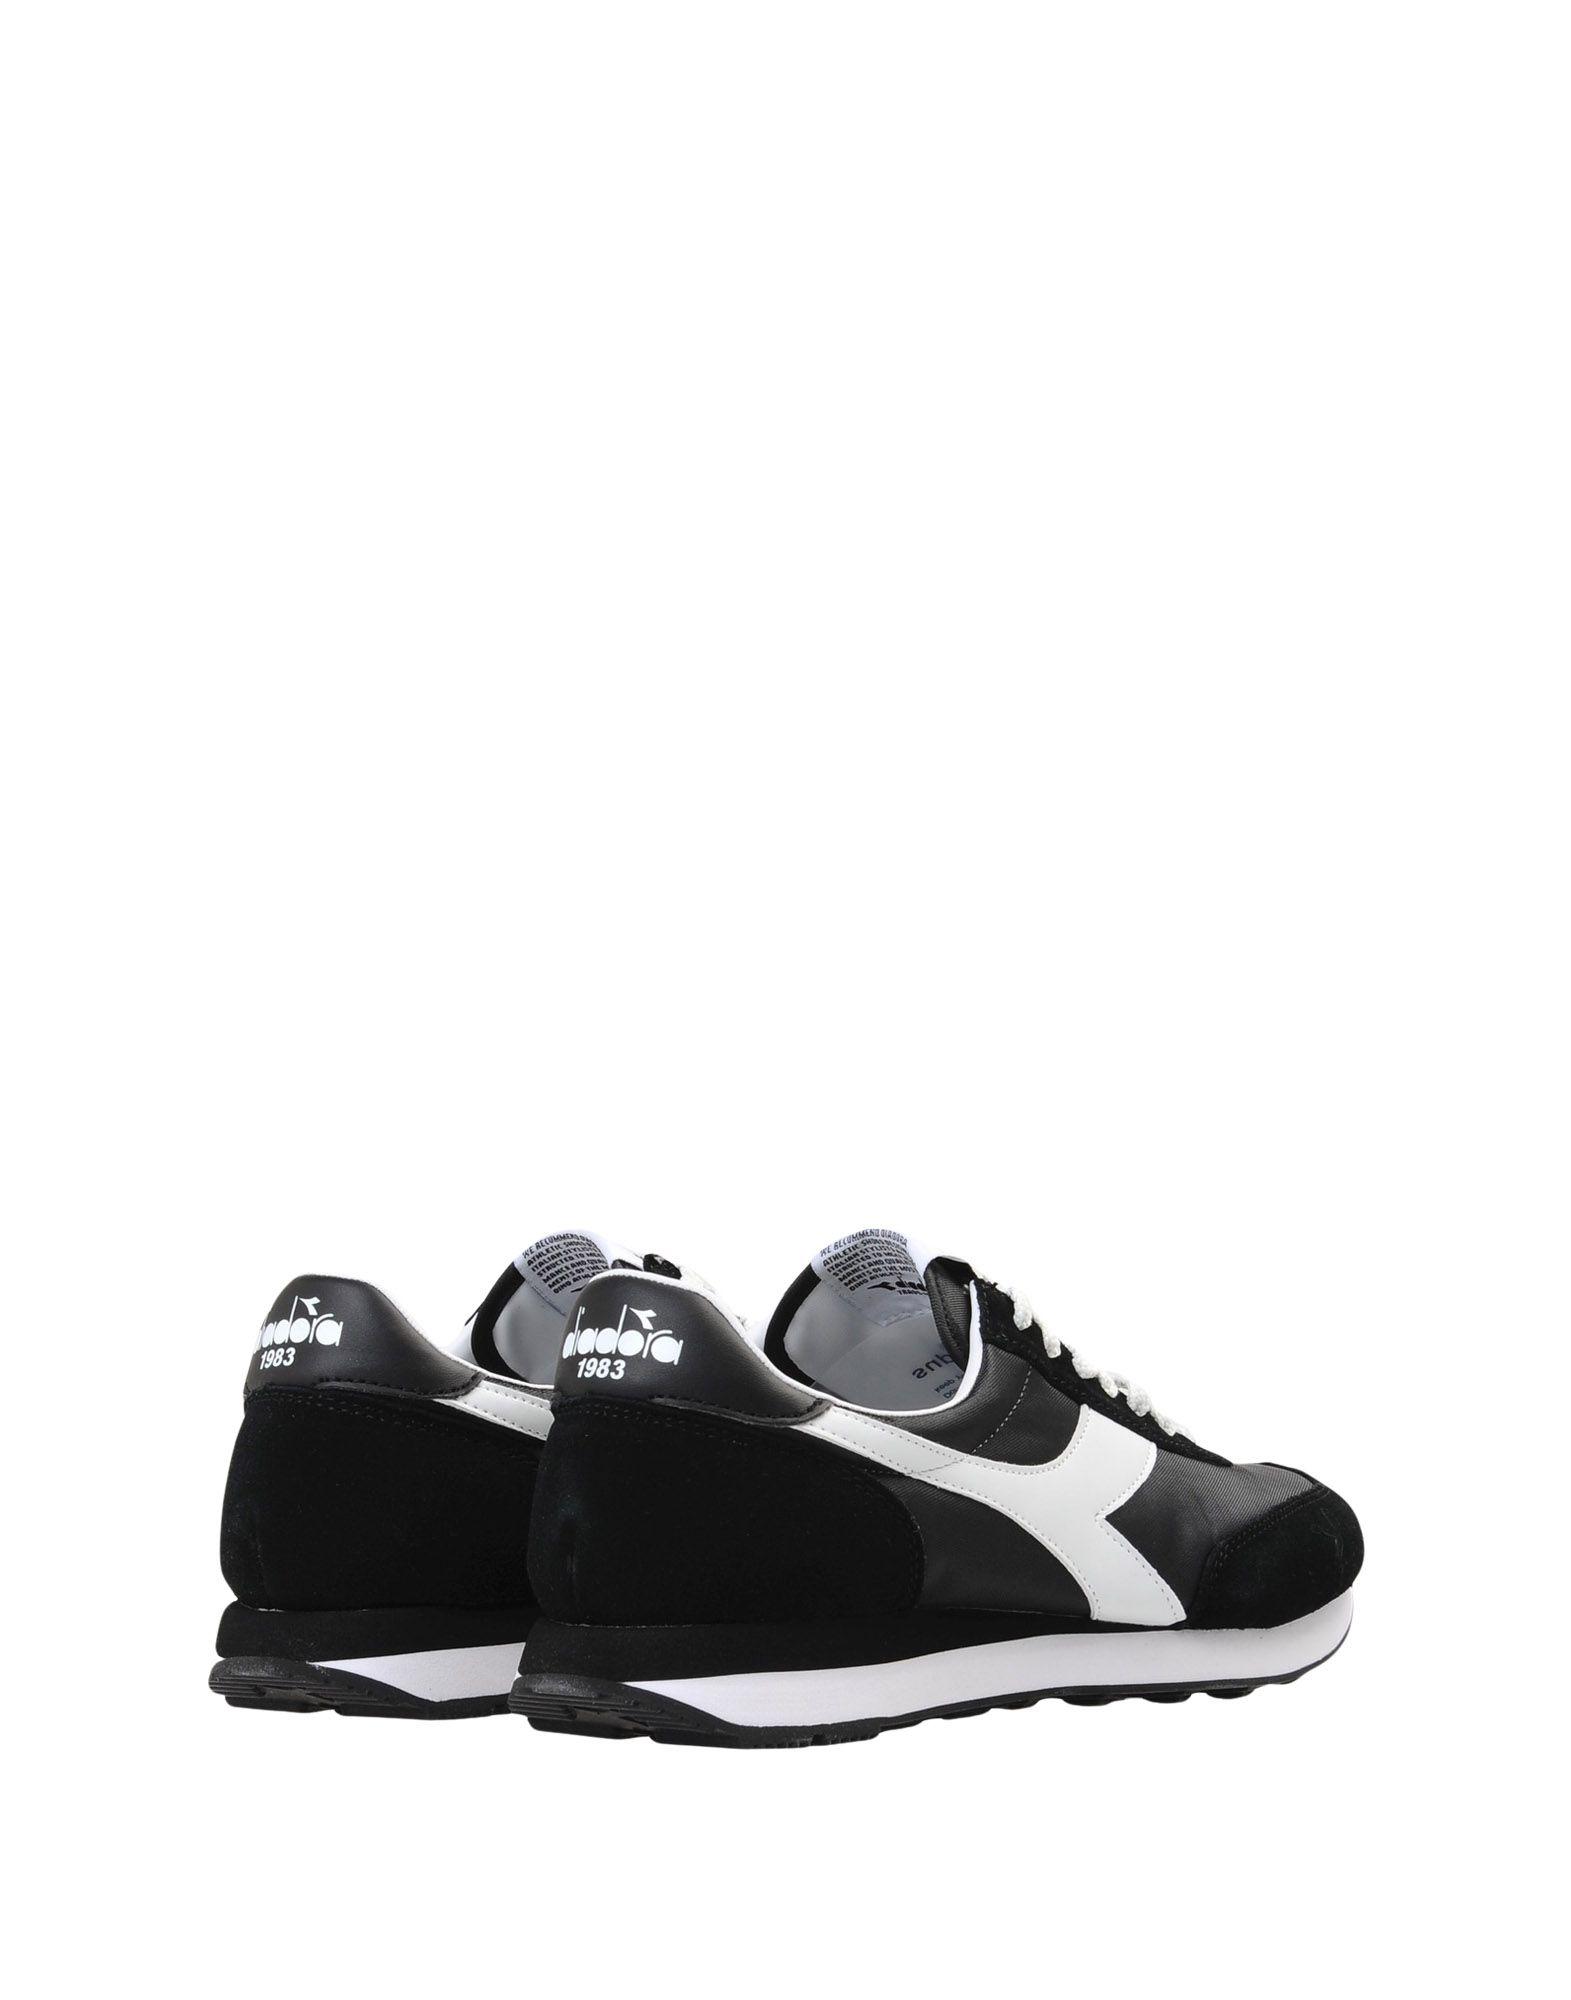 Sneakers Diadora Heritage Koala - Femme - Sneakers Diadora Heritage sur